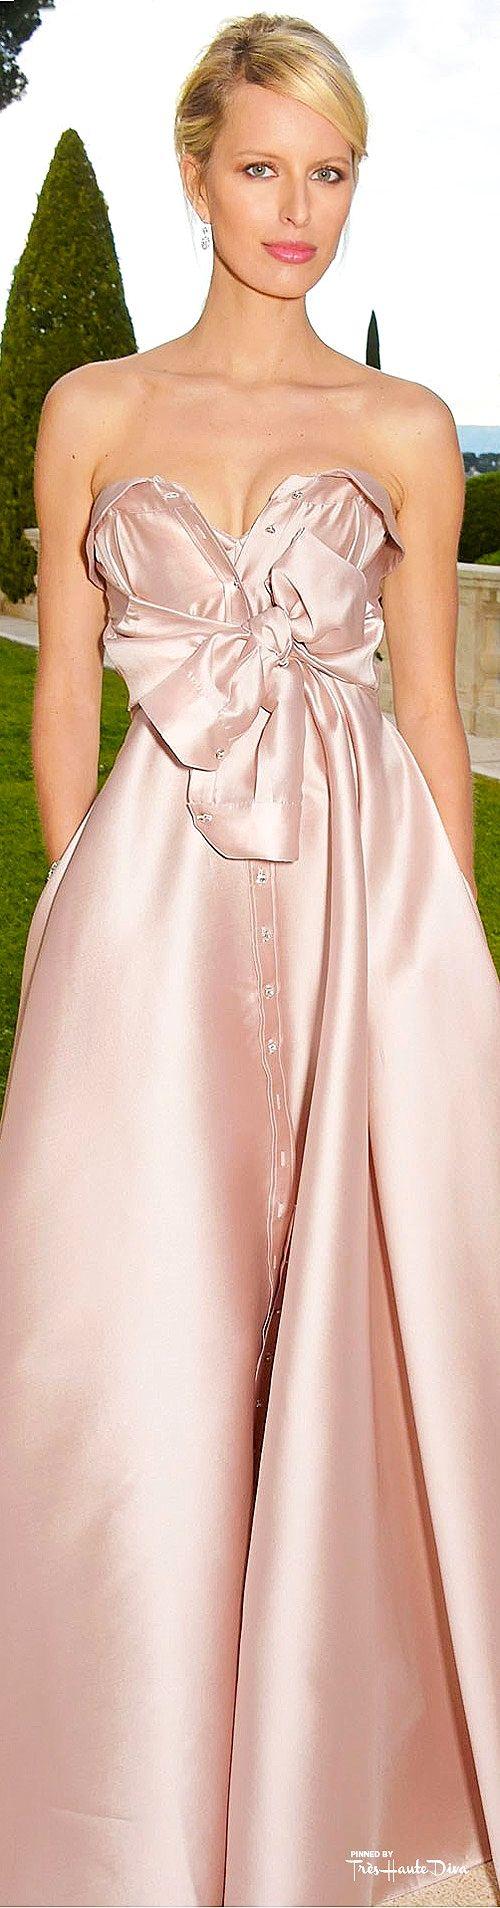 #Karolina #Kurkova in Alexis Mabille Couture♔ Cannes Film Festival 2015 Red Carpet ♔ Très Haute Diva ♔